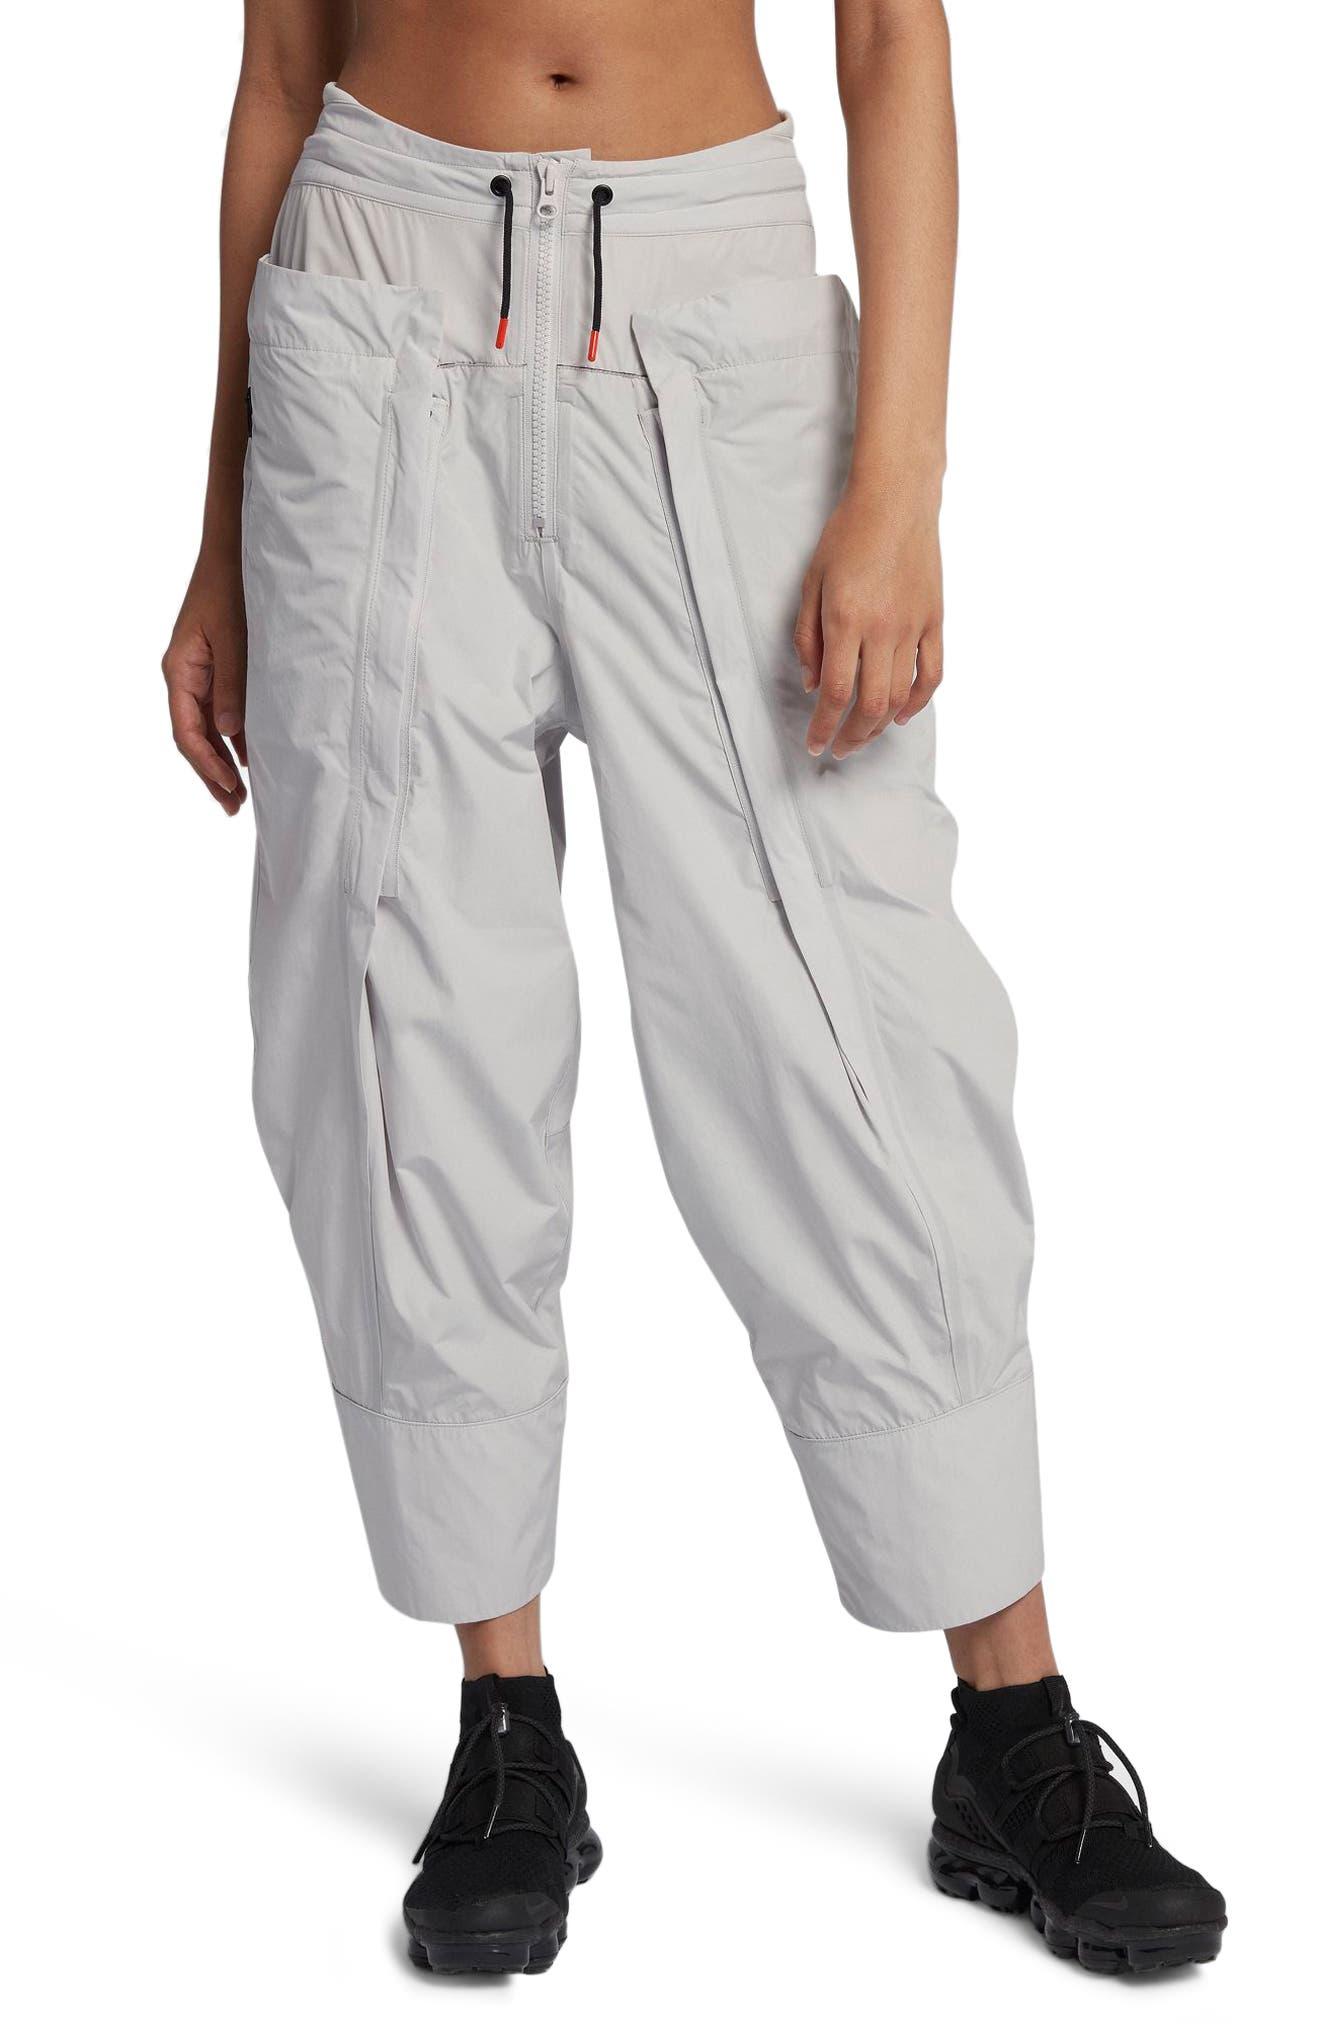 NikeLab ACG Women's Cargo Pants,                             Main thumbnail 1, color,                             Vast Grey